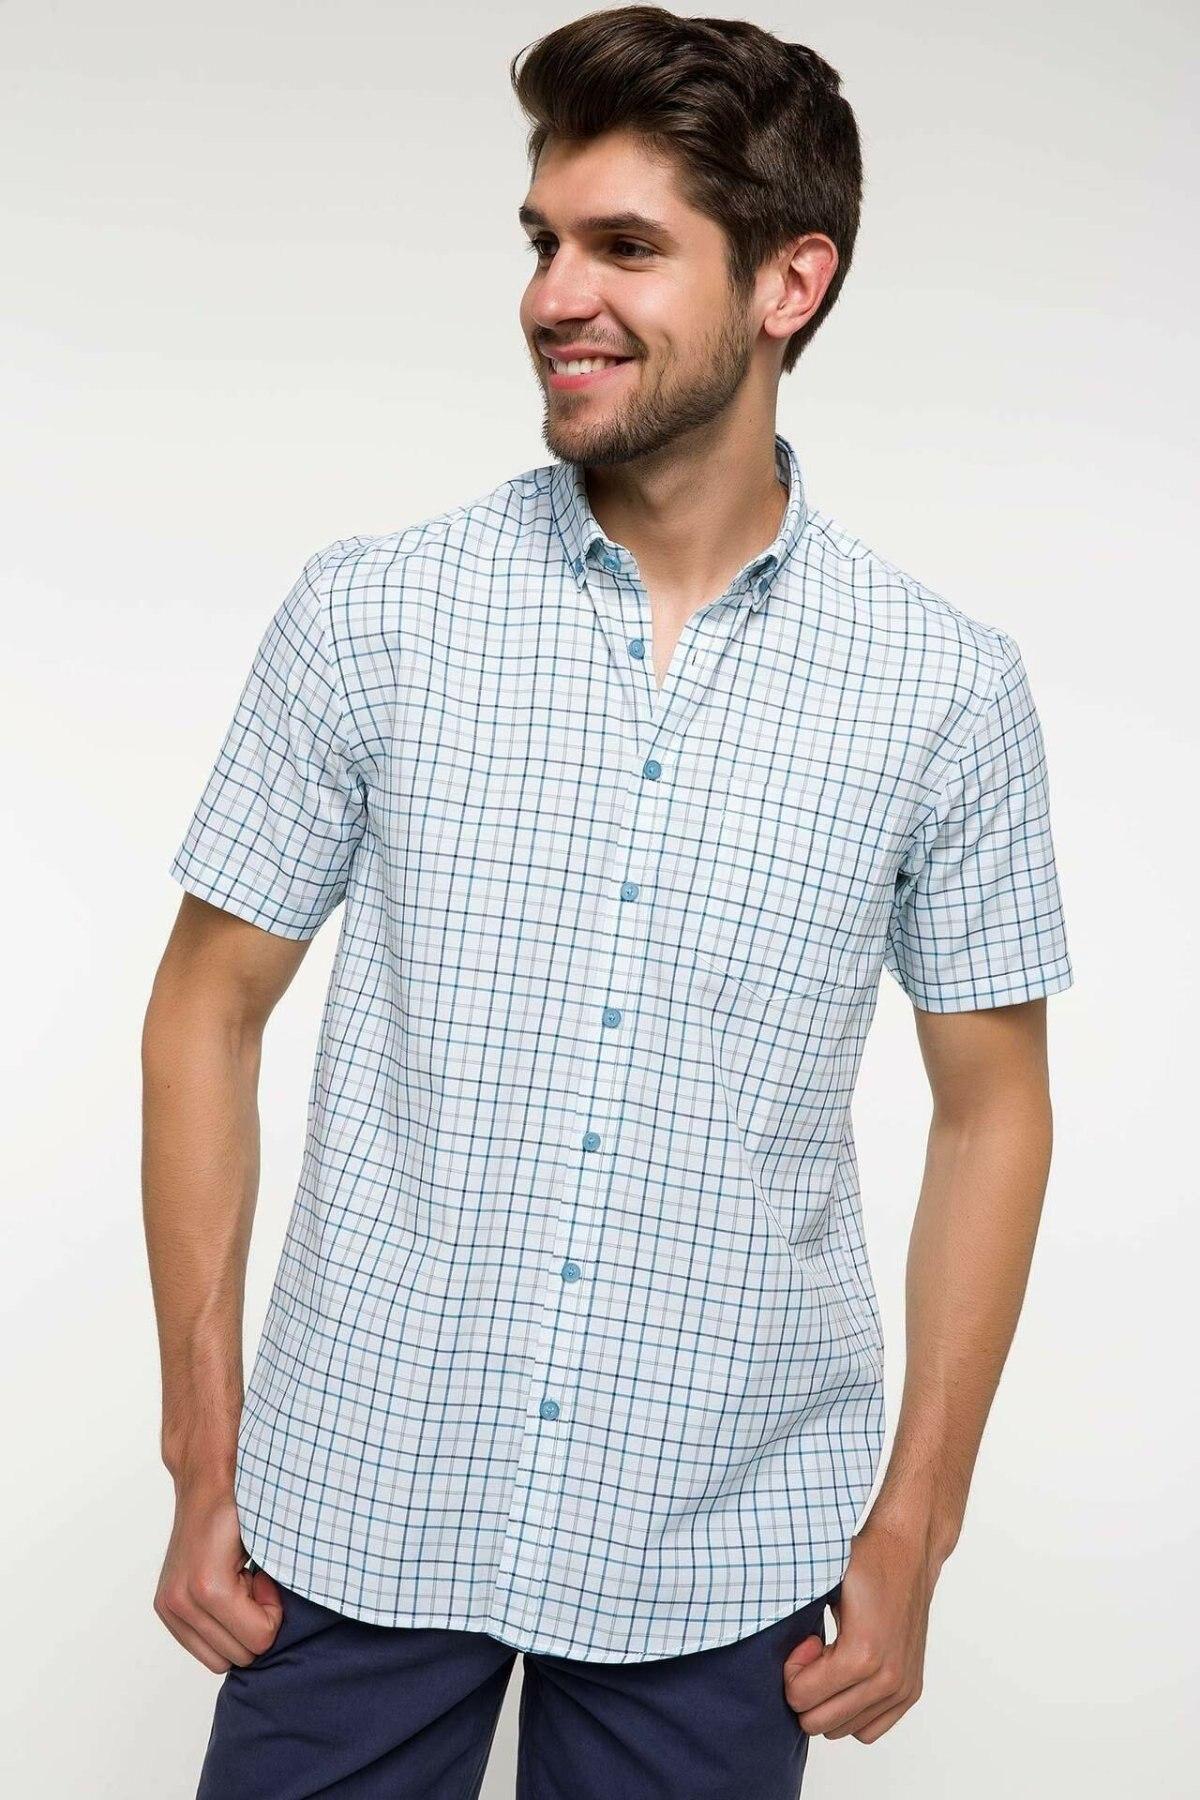 DeFacto Men Fashion Plaid Lapel Collar Shirts Short Sleeve Simple Shirts Men Shirt Tops- I3616AZ18SMGN368-I3616AZ18SM